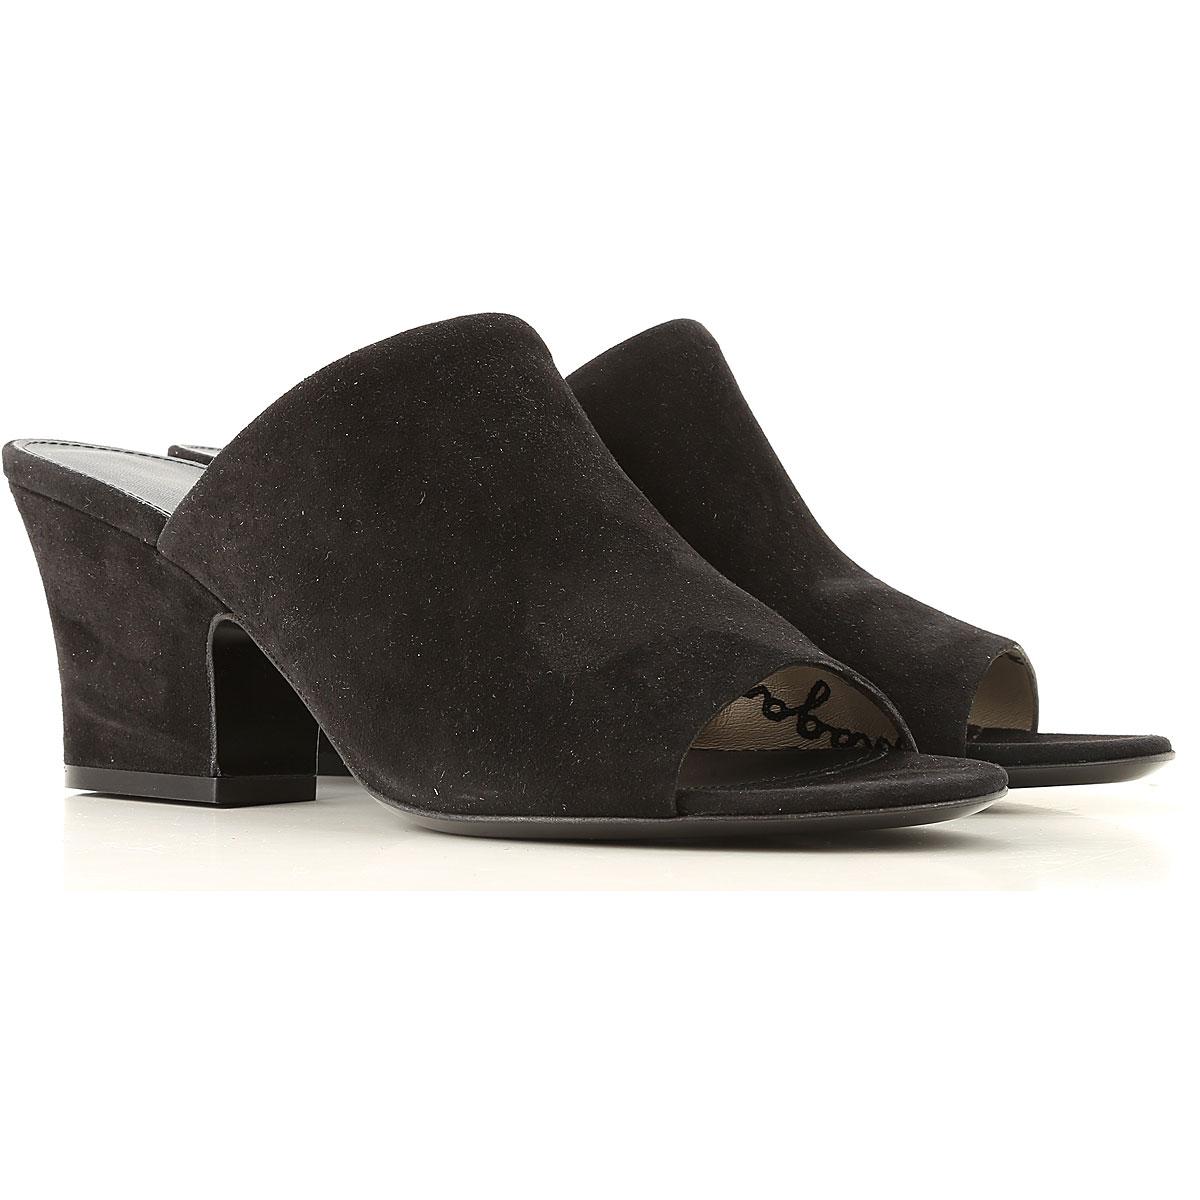 Salvatore Ferragamo Sandals for Women, Black, Suede leather, 2019, 5.5 6.5 8.5 9.5